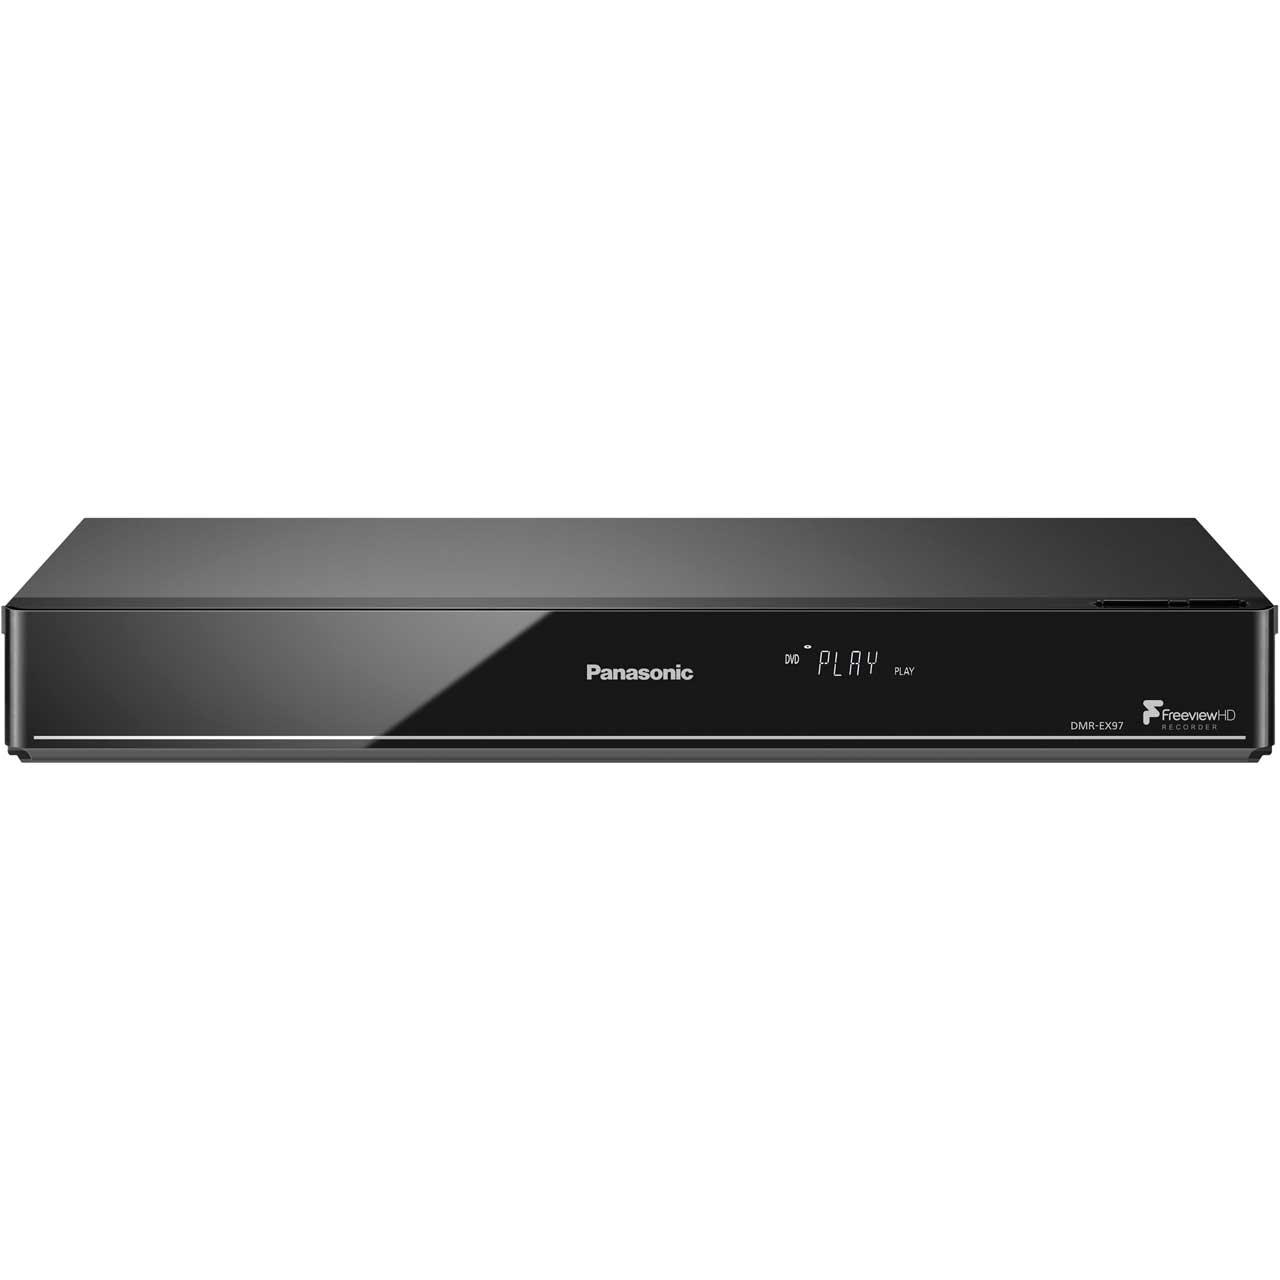 Panasonic DVD Recorder Hard Drive